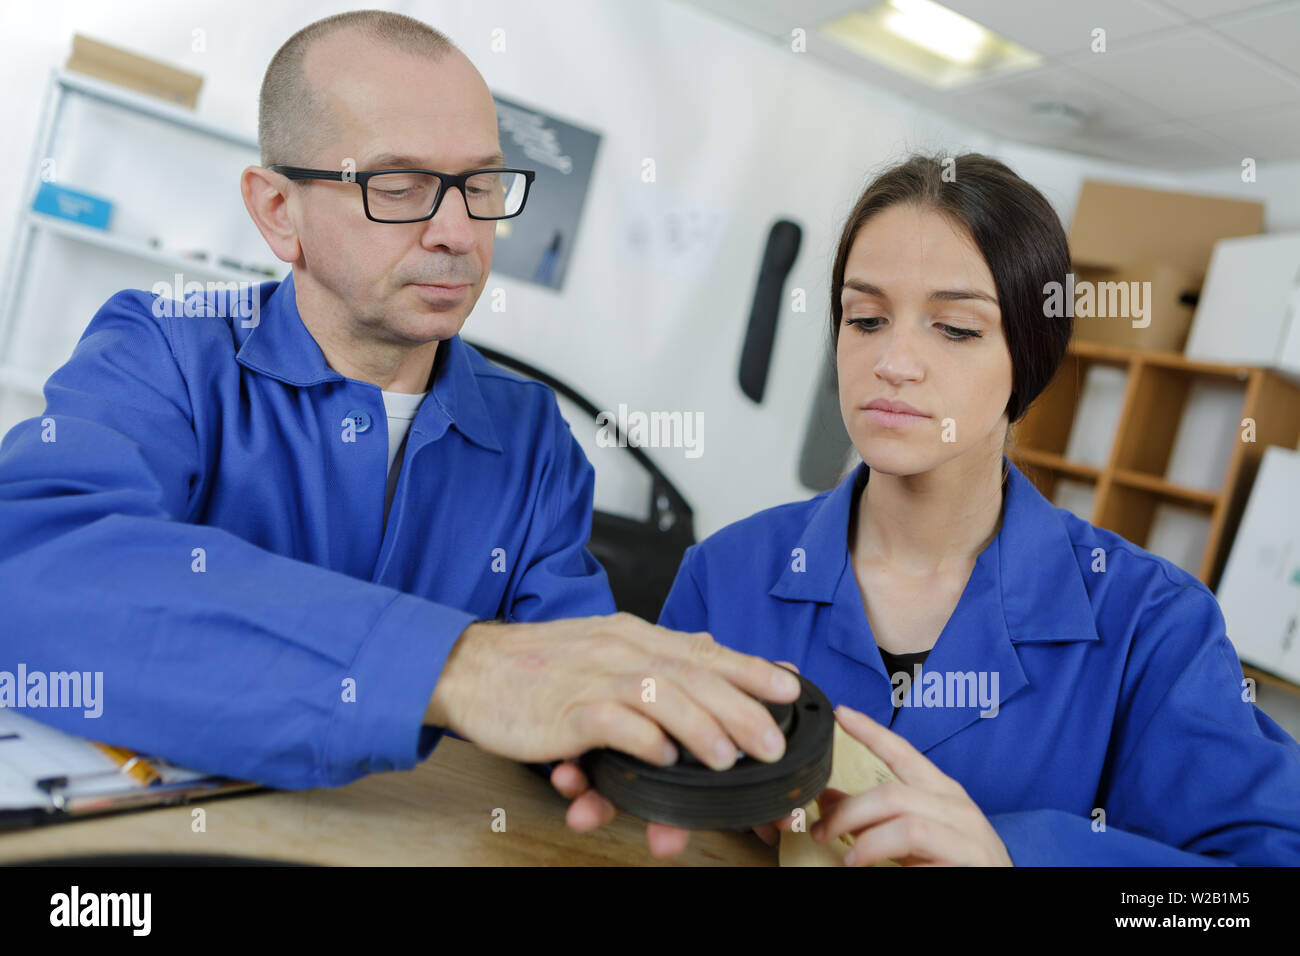 mechanic teaching an intern the best practice - Stock Image